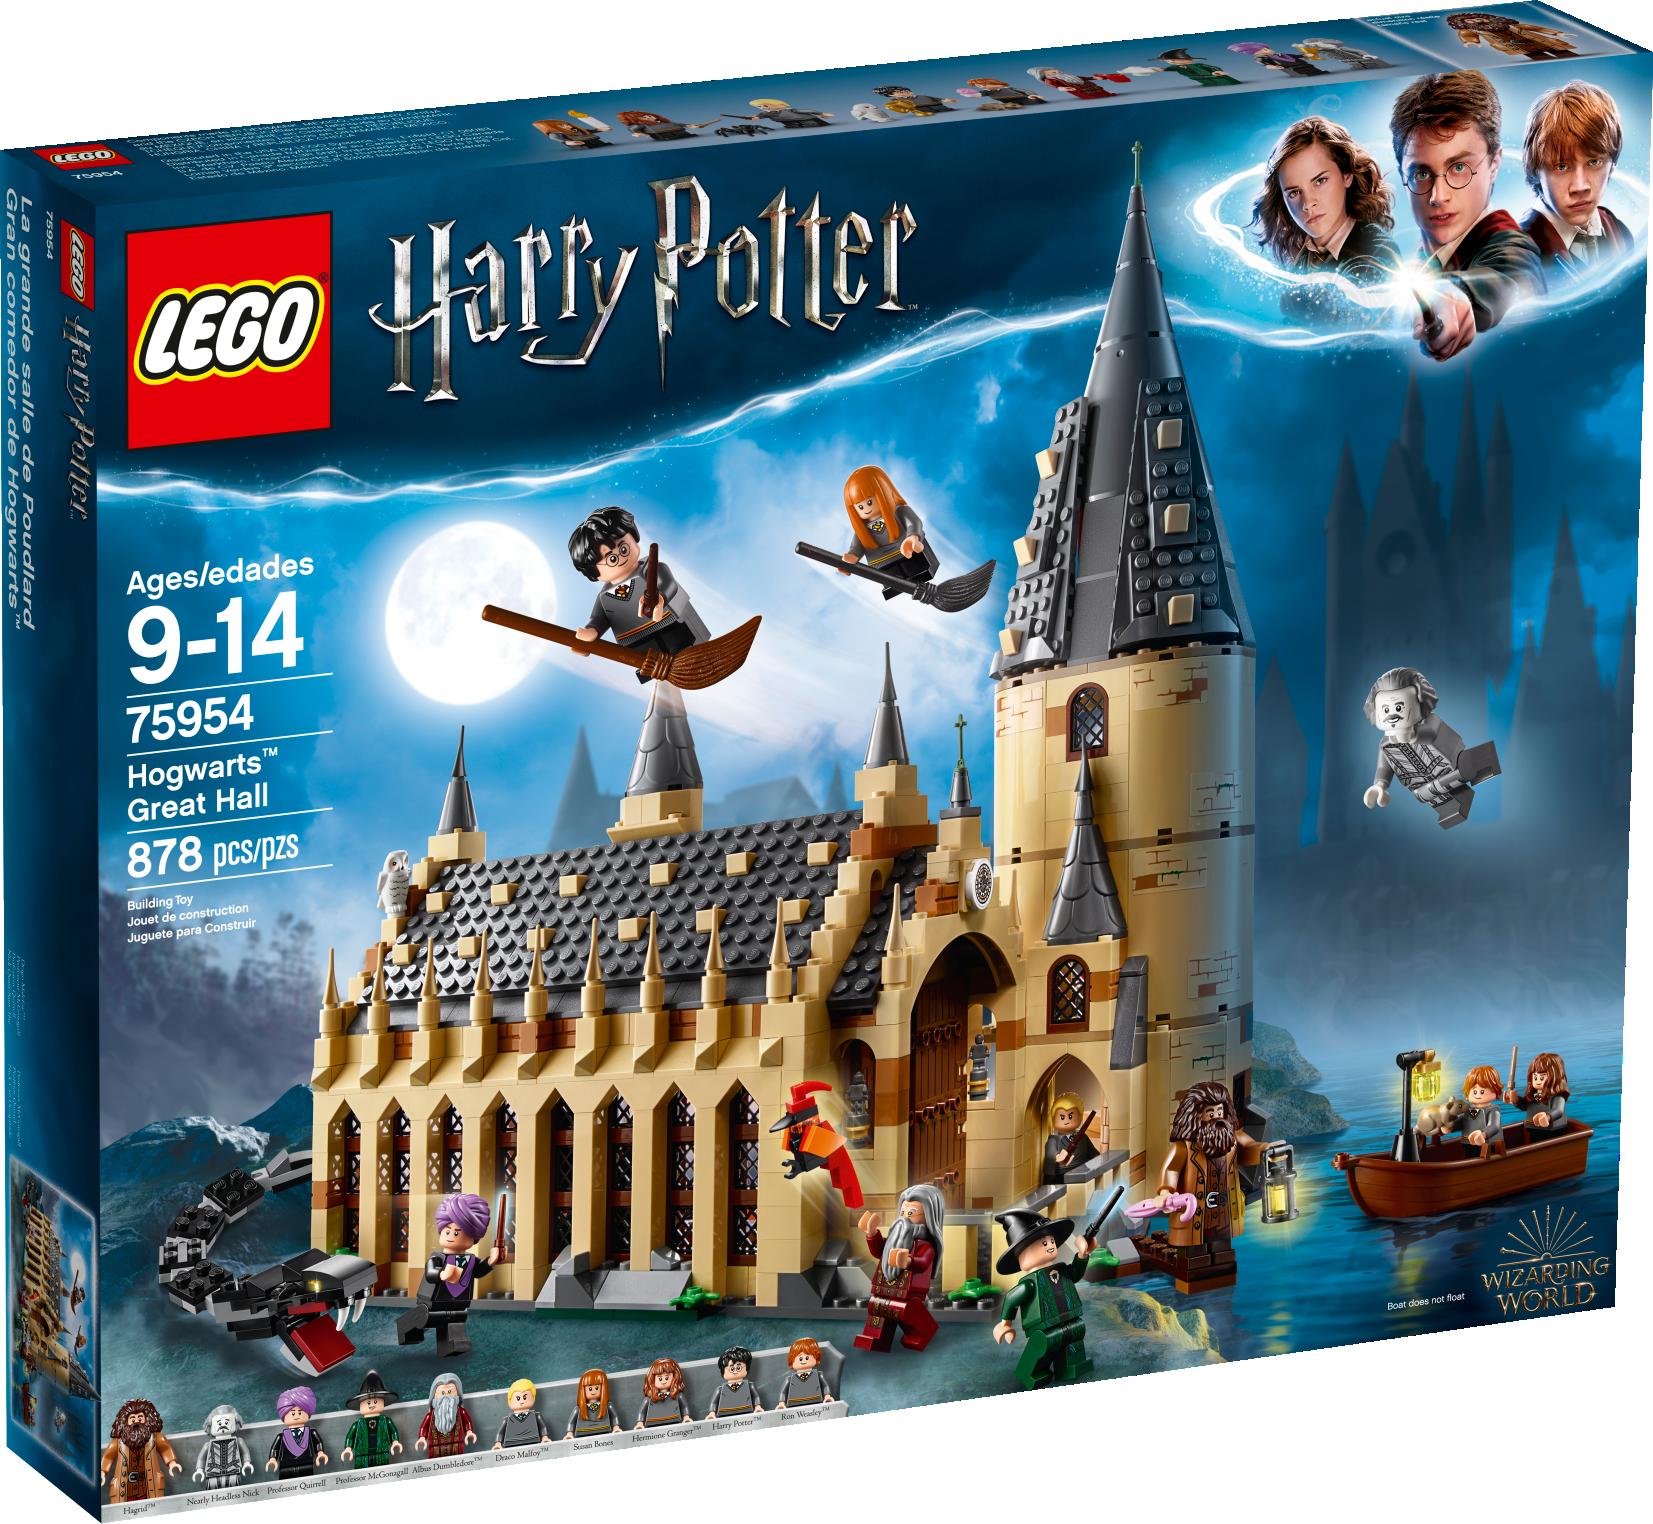 Hogwarts™ Great Hall